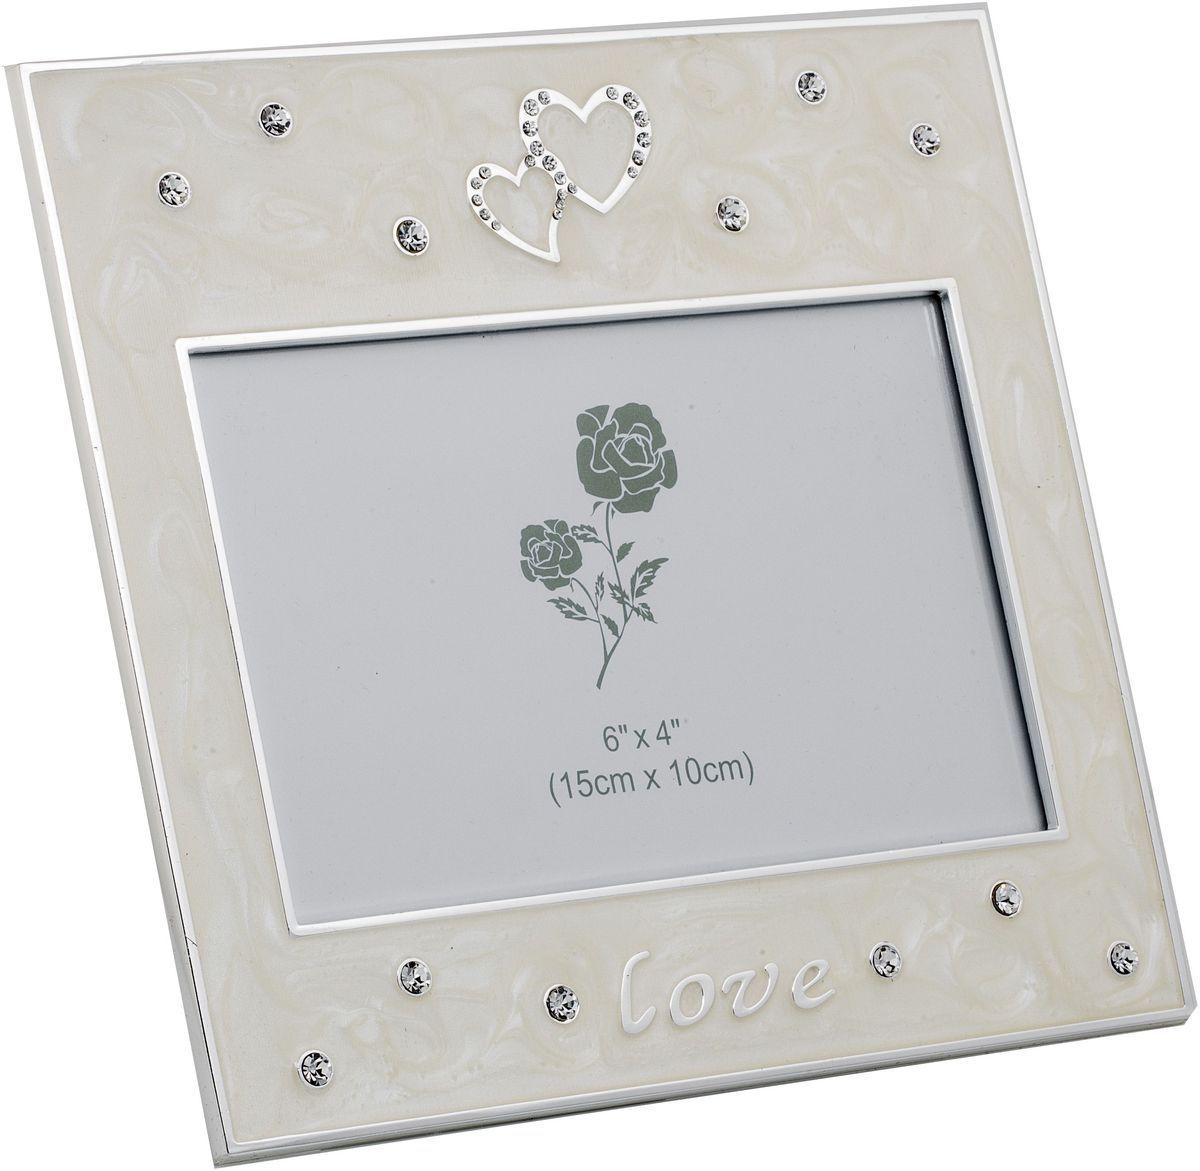 Фоторамка Platinum Love, 10 х 15 см. PF1417-4 фоторамка птица 10 x 15 см 25808